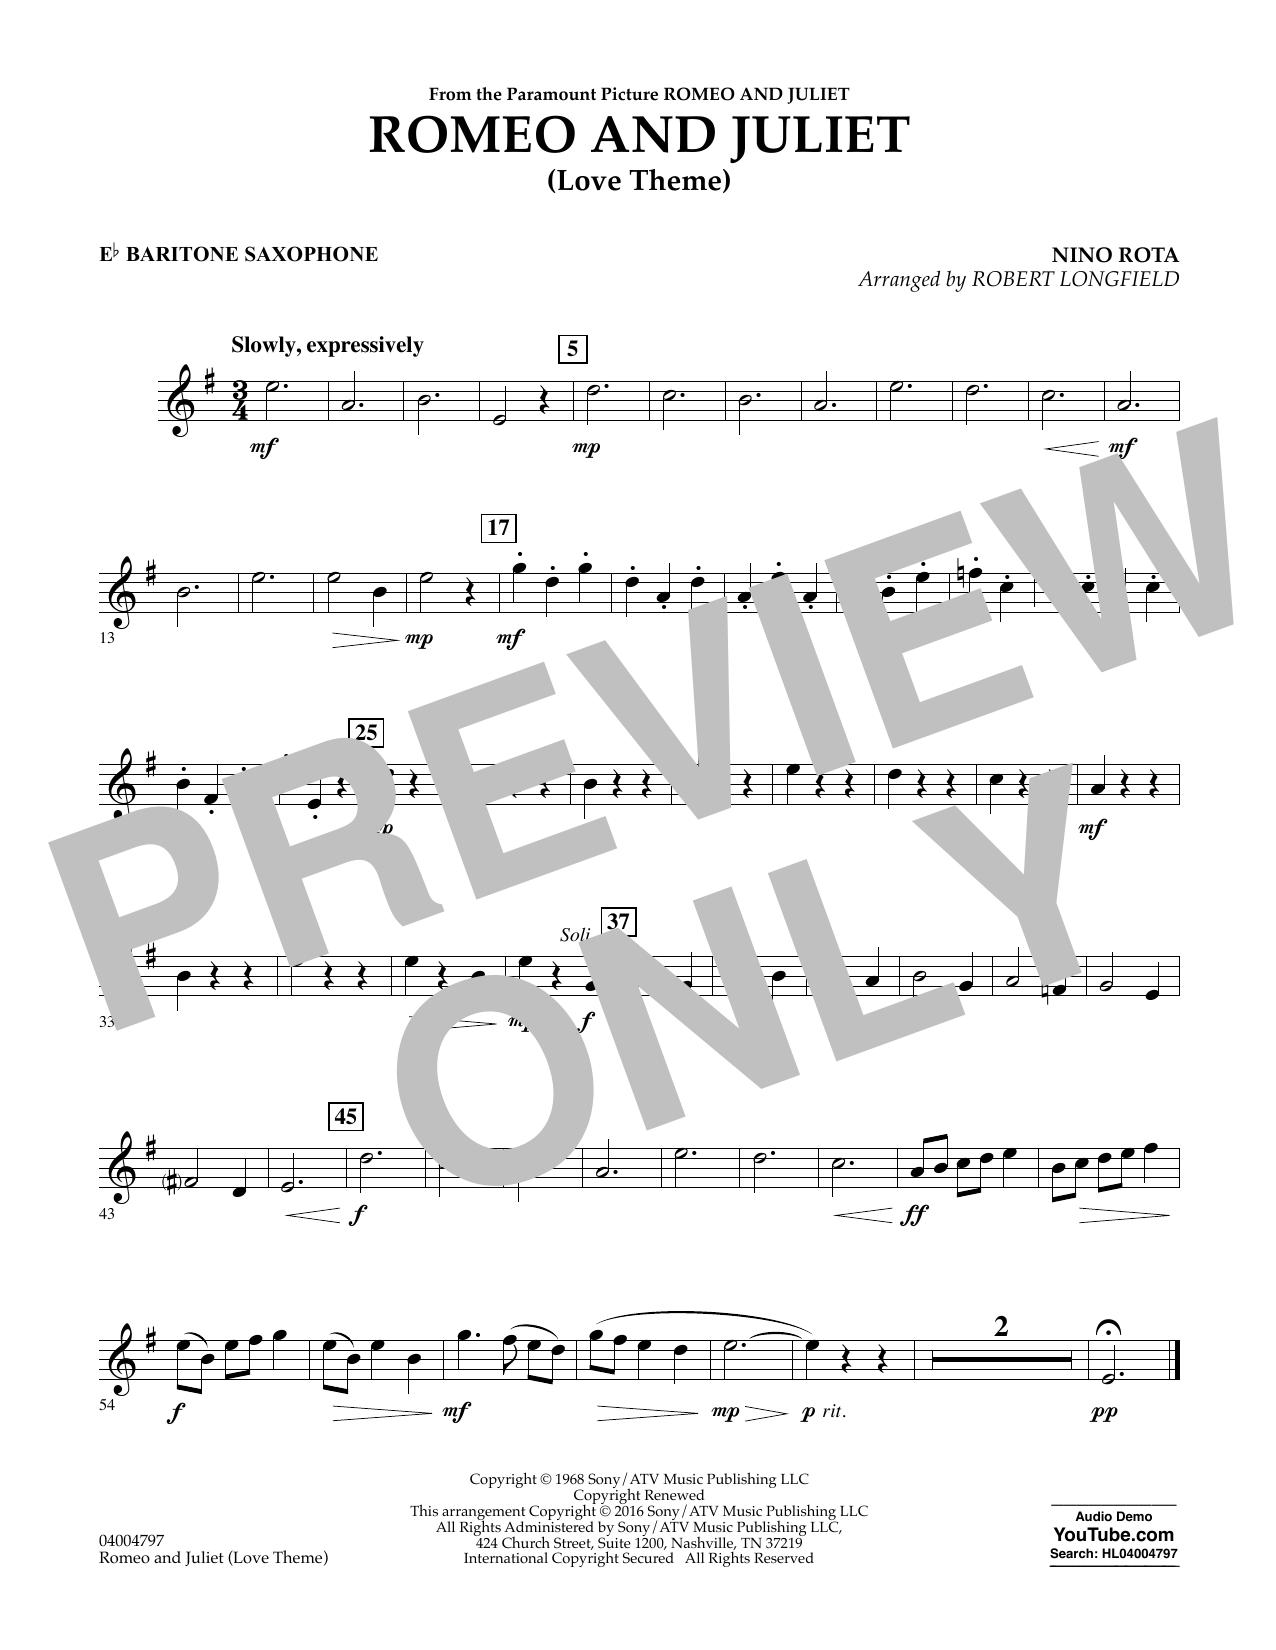 Romeo and Juliet (Love Theme) - Eb Baritone Saxophone (Concert Band)